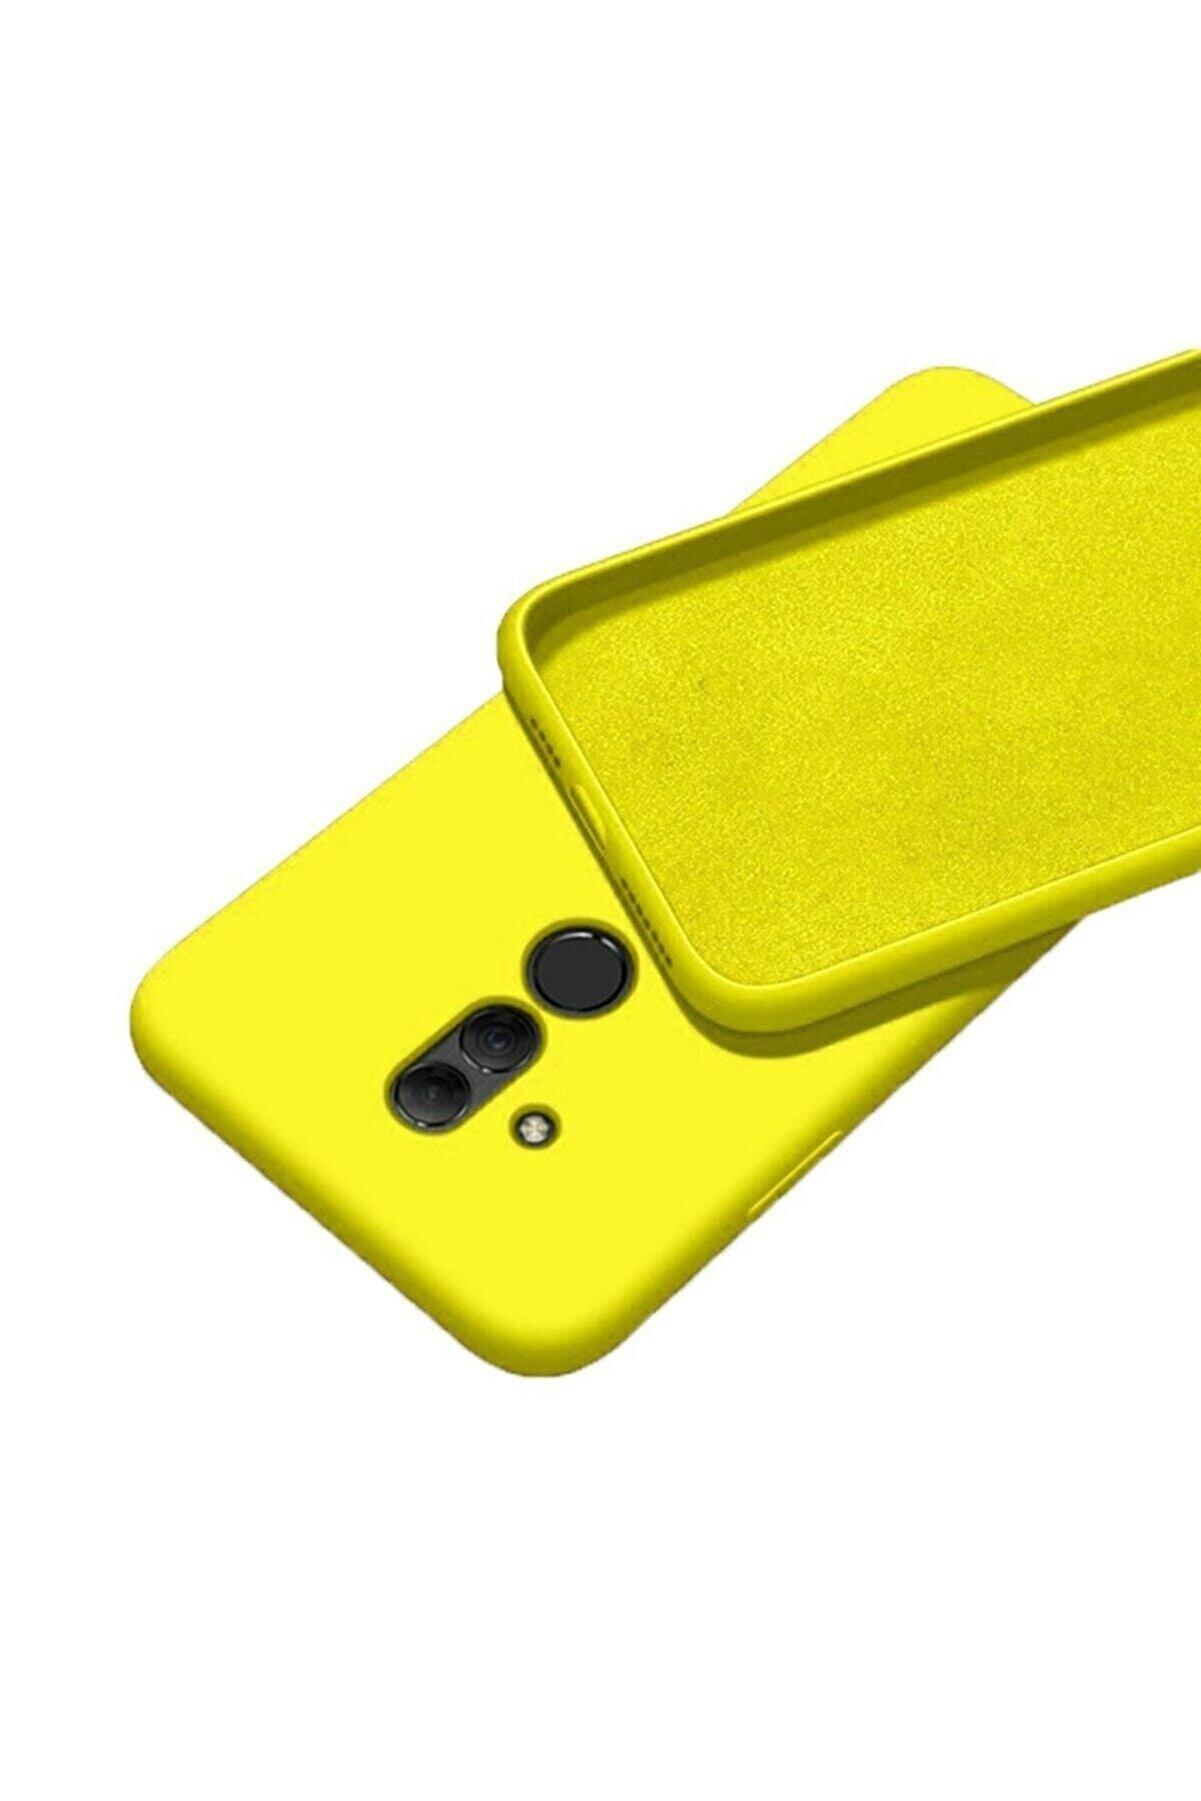 Mopal Huawei Mate 20 Lite Içi Kadife Lansman Silikon Kılıf